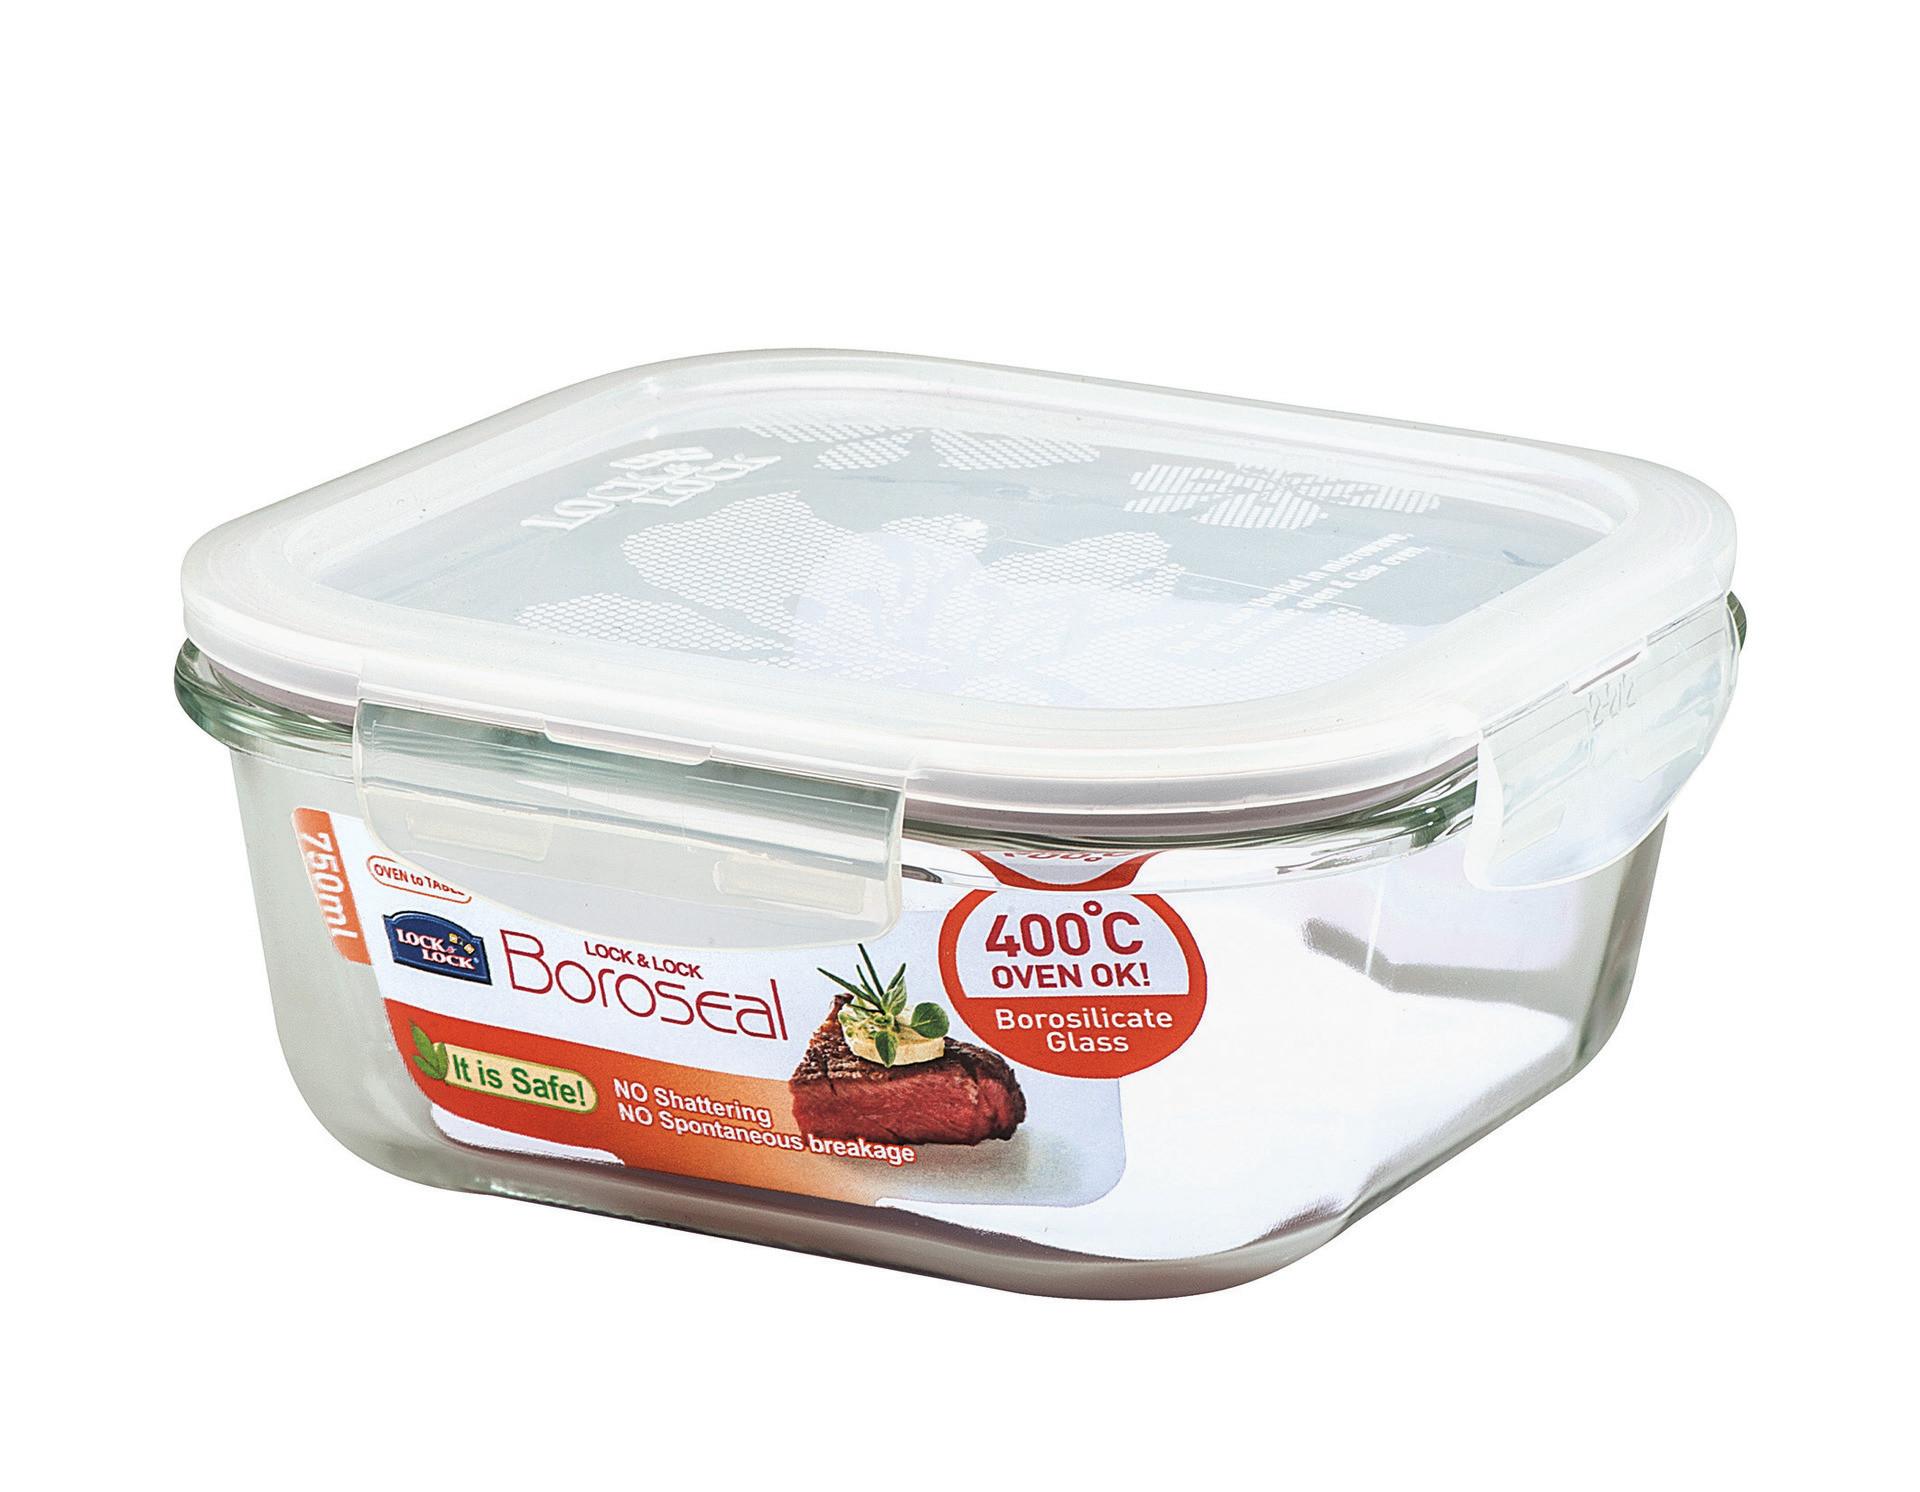 Kühlschrank Quadratisch : Multifunktionsbox quadratisch 0 75 l 155 x 155 x 69 mm pentagast